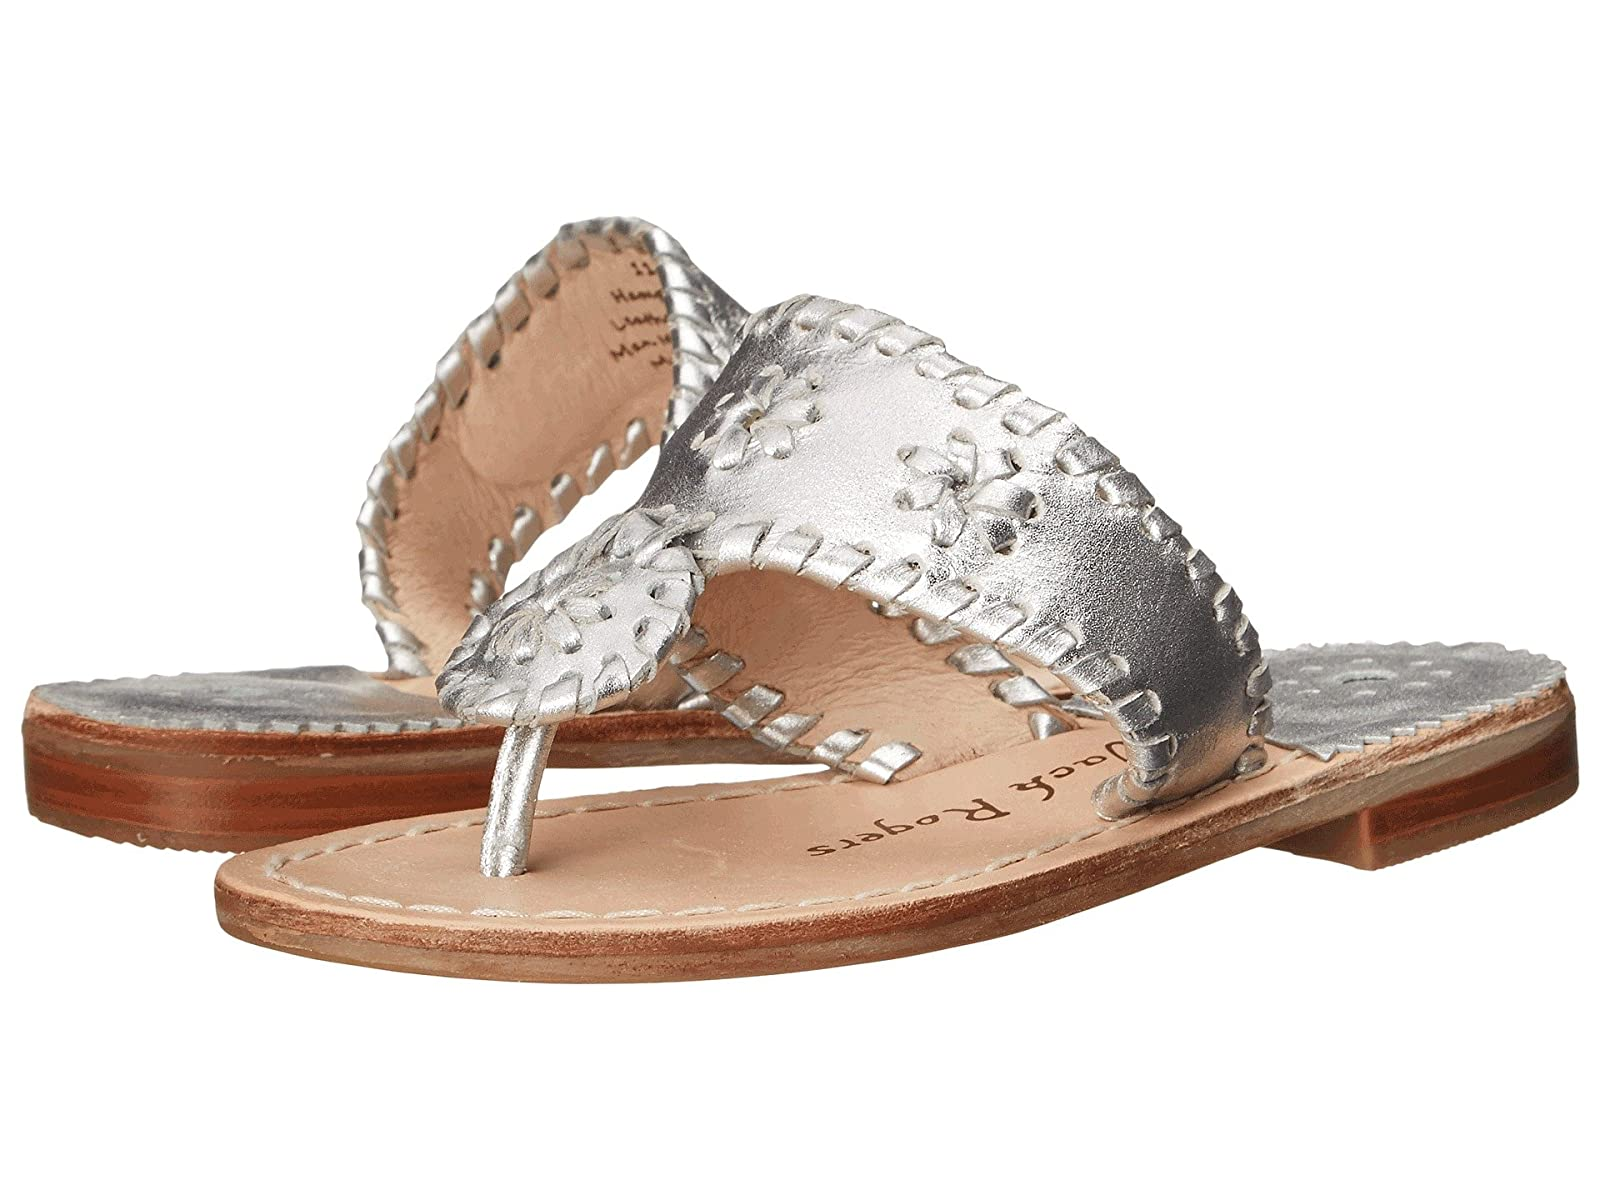 Jack Rogers Miss Hamptons II (Toddler/Little Kid/Big Kid)Atmospheric grades have affordable shoes